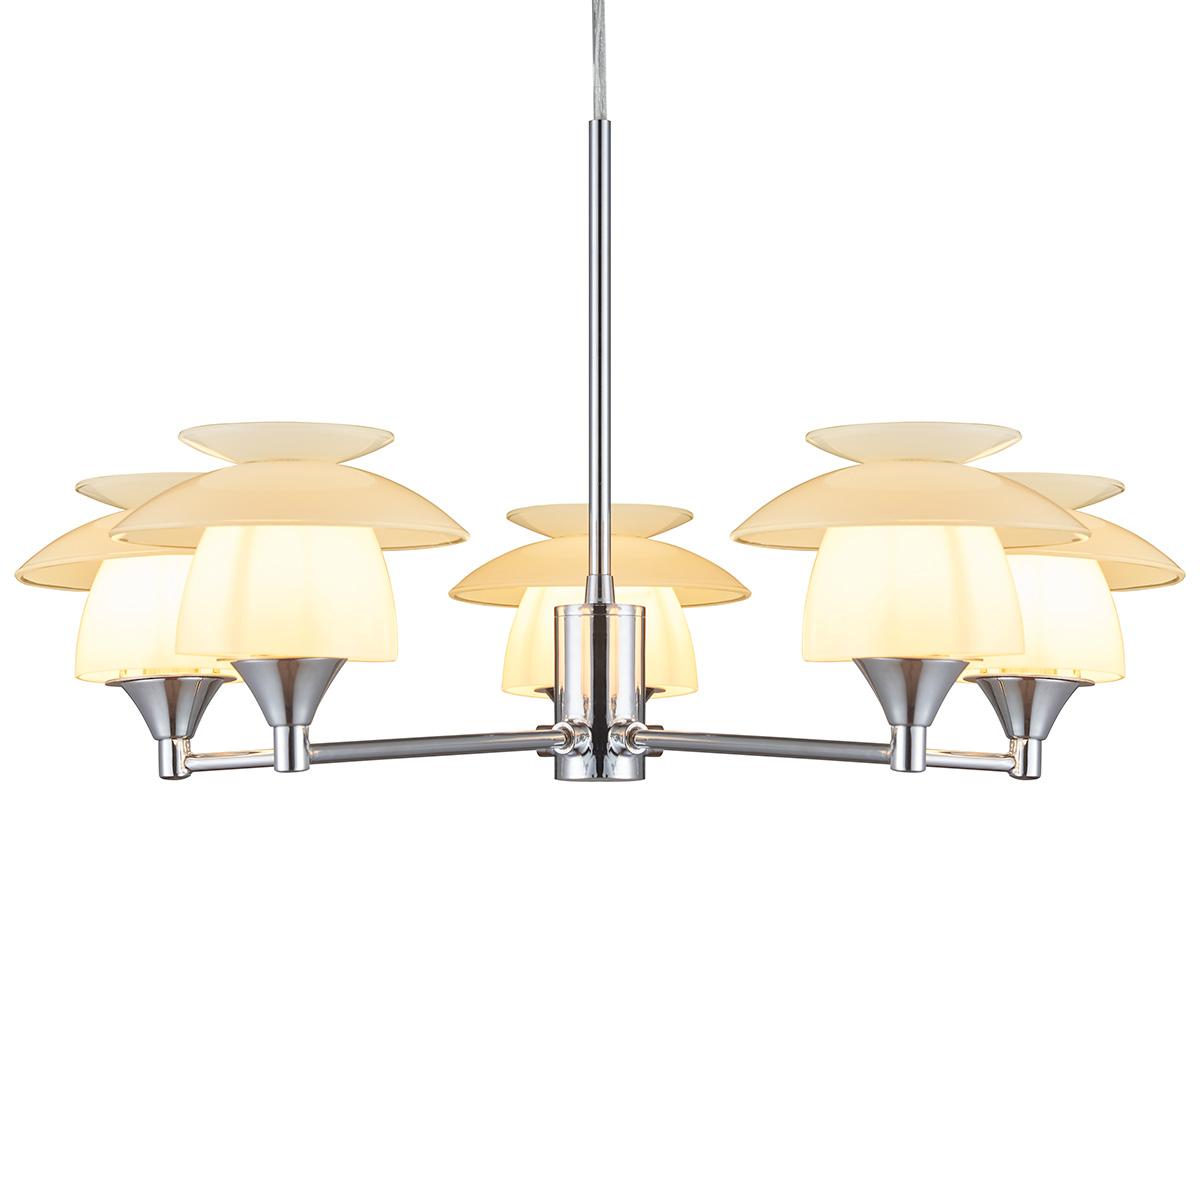 Image of   Halo Design loftlampe - Scandinavia - Hvid